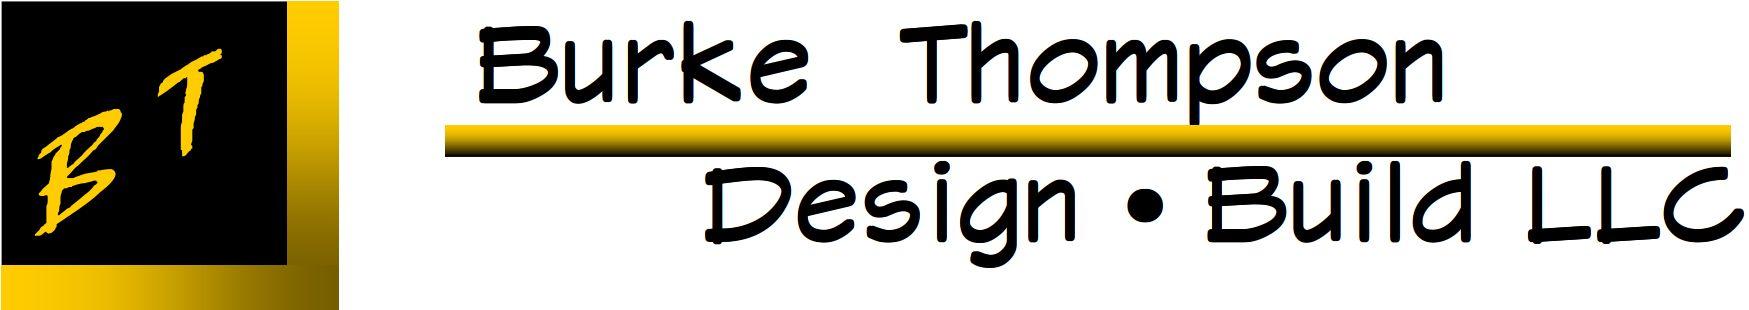 Burke Thompson Design Build,33823